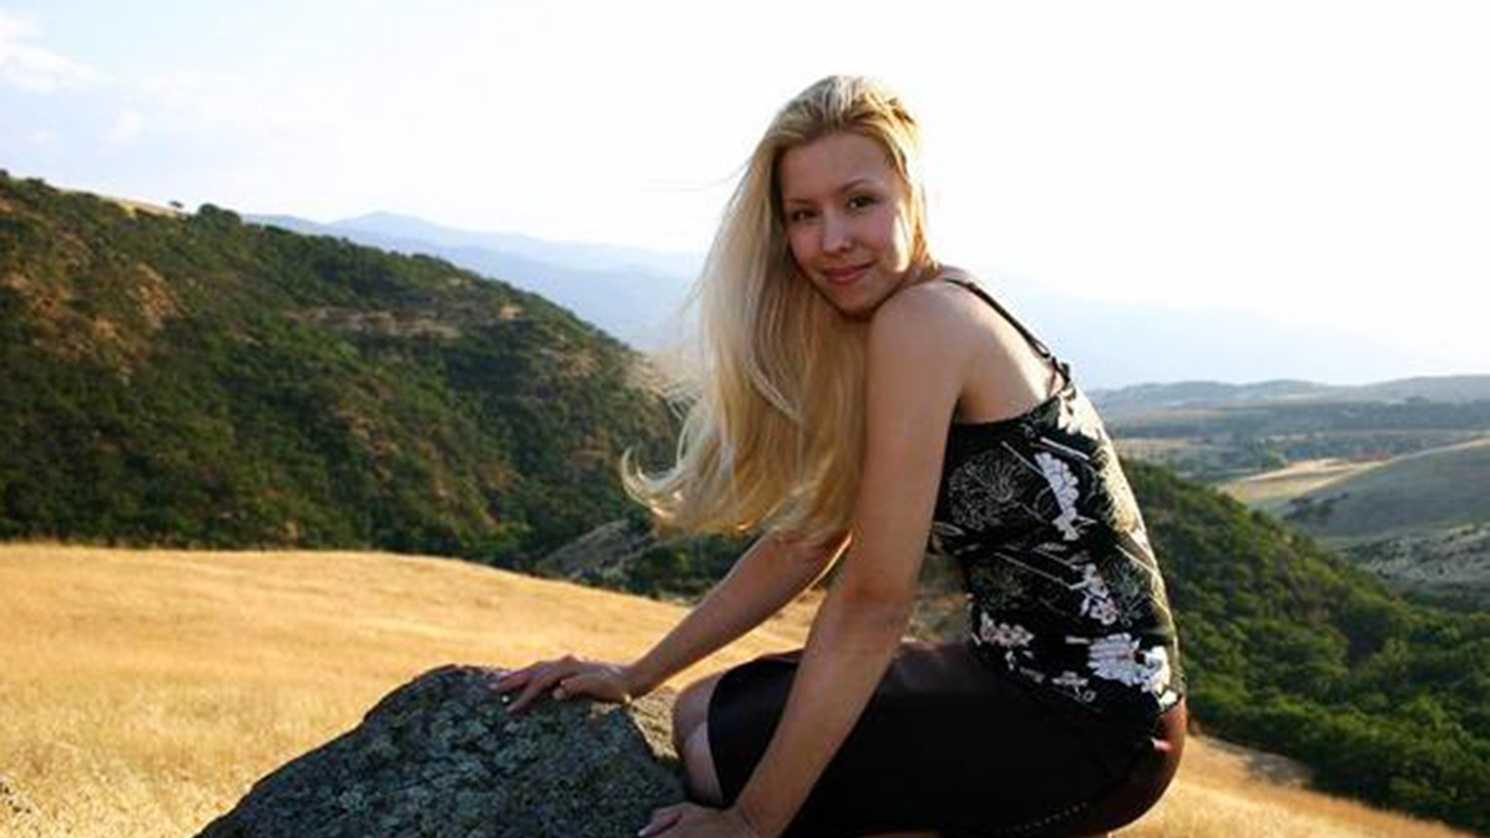 Jodi Arias was born in Salinas, Calif. on July 9, 1980